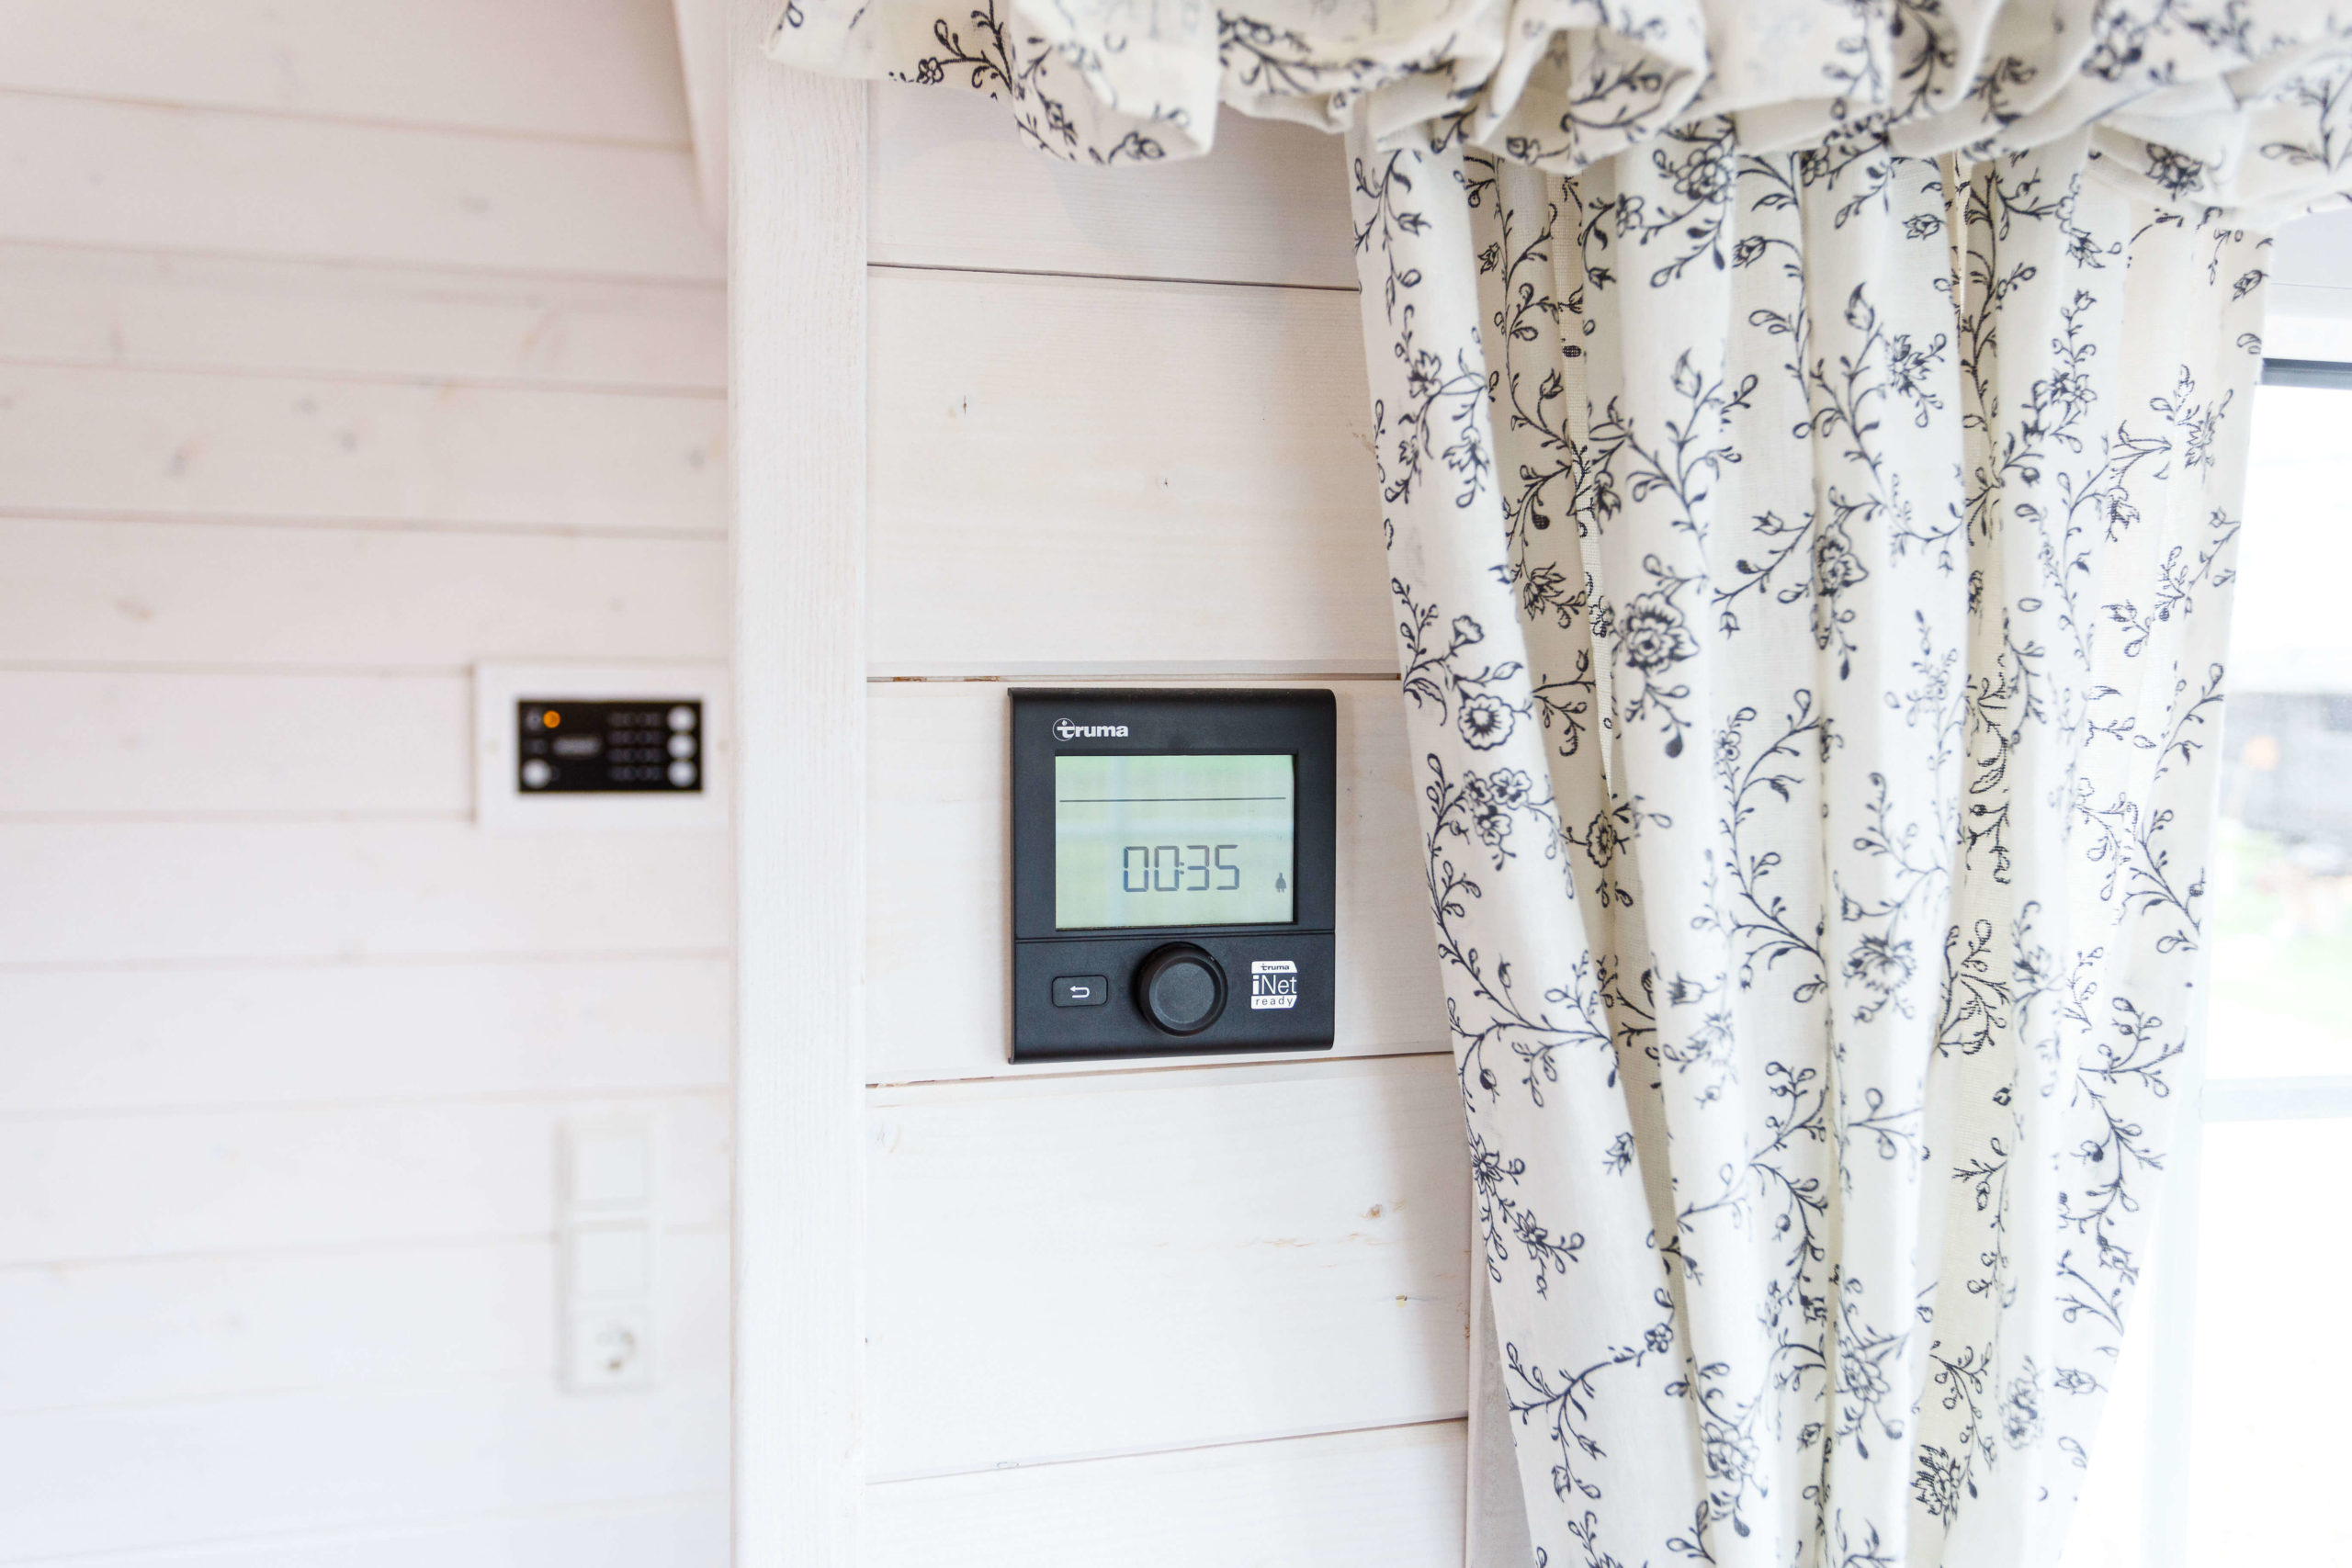 mobiles-tiny-house-schweden-vital-camp-gmbh-53